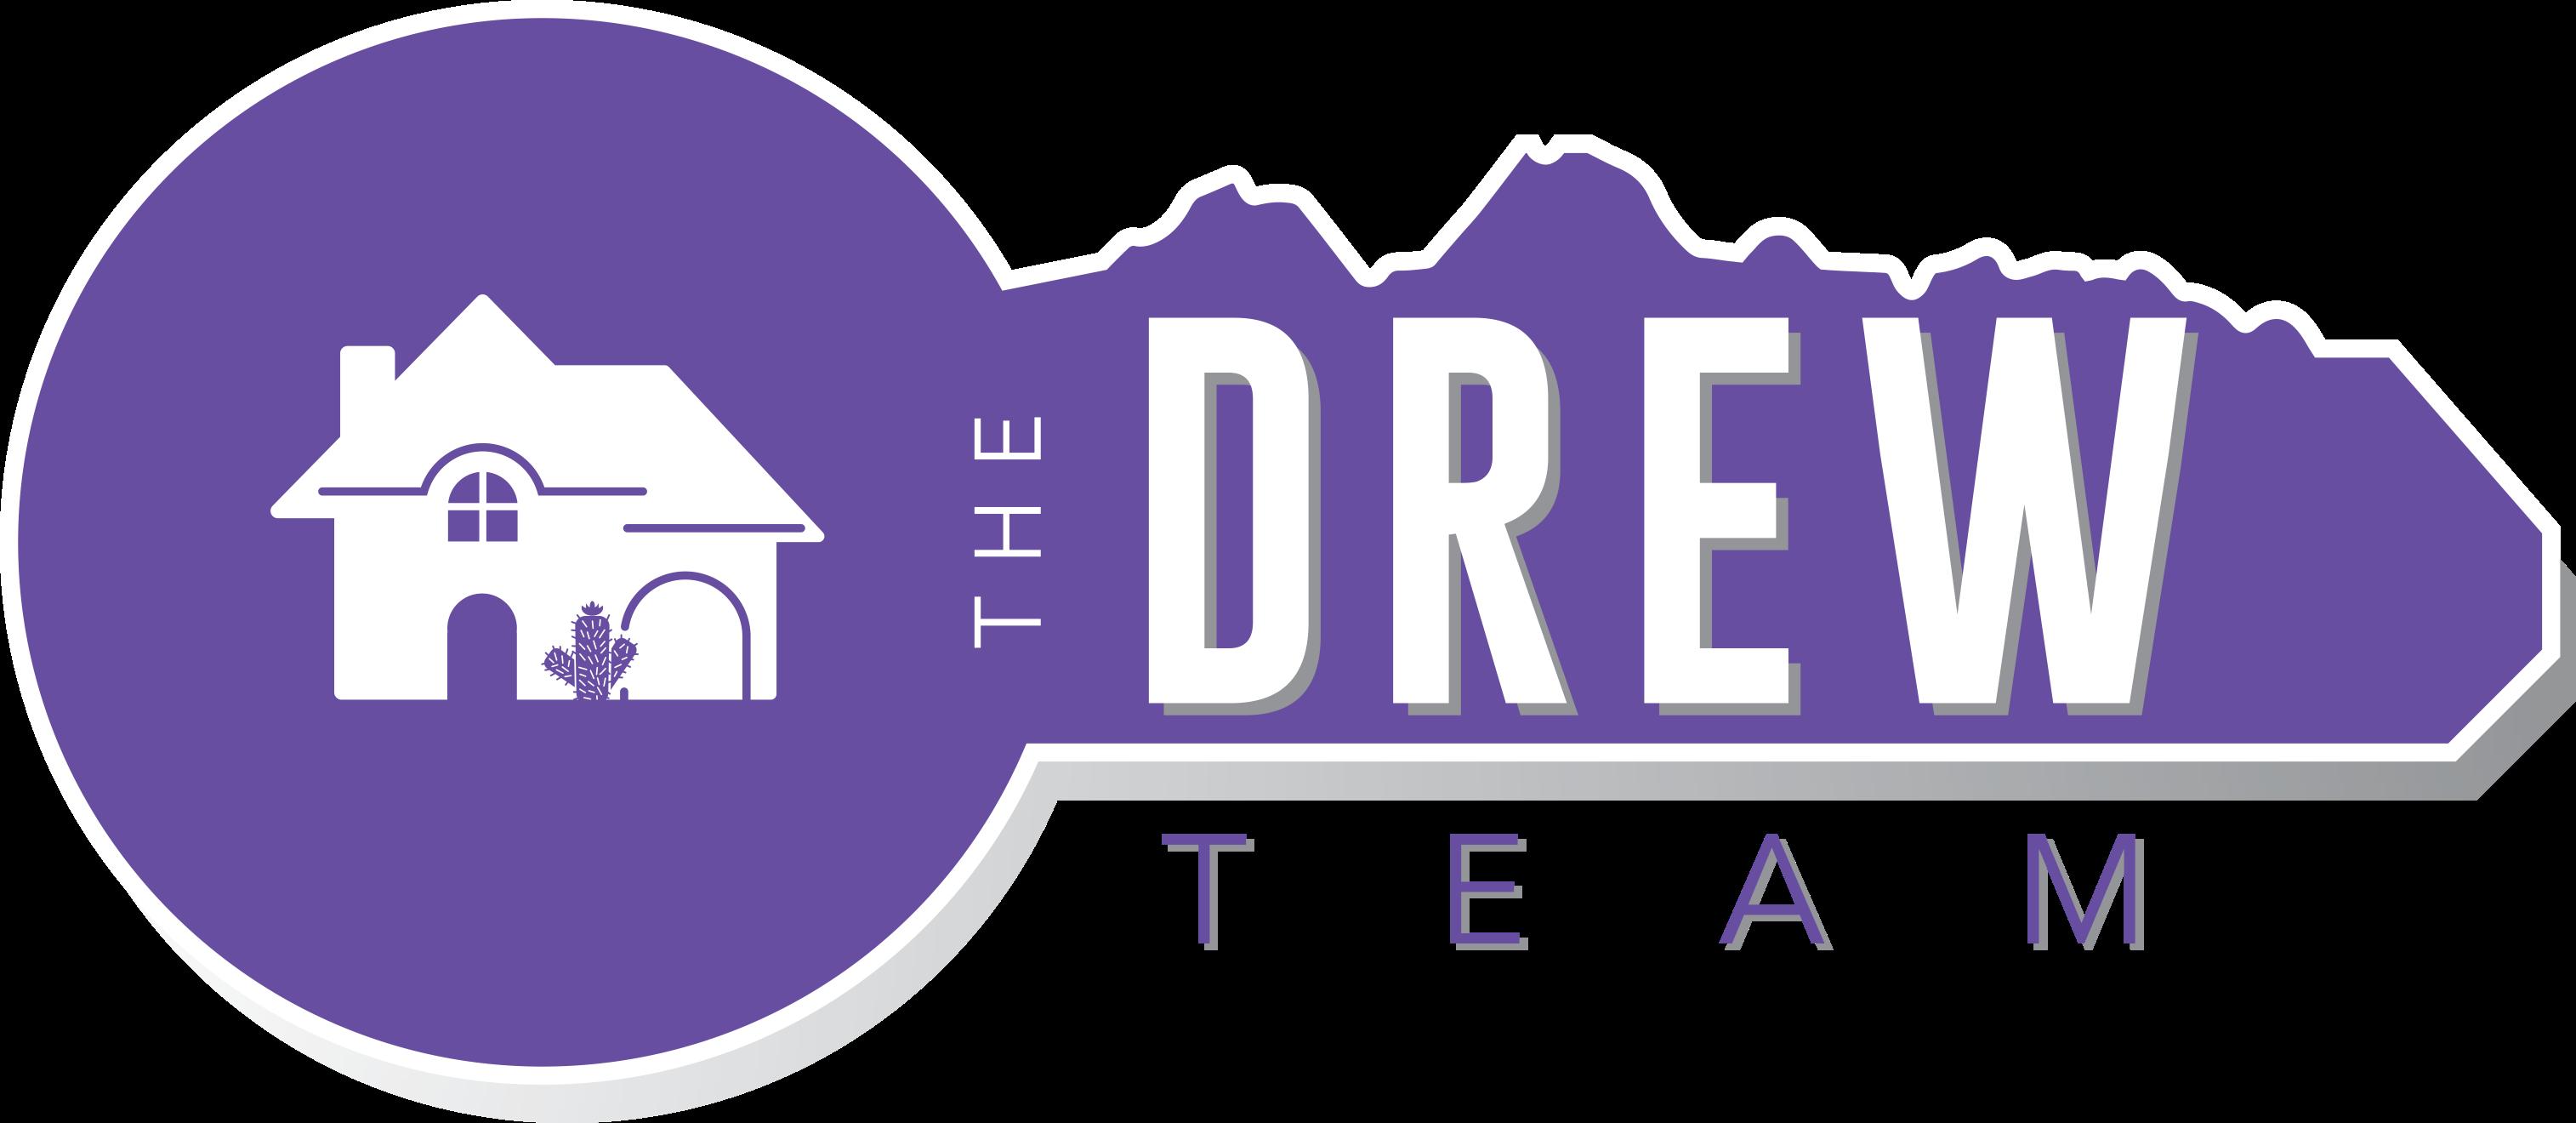 The Drew Team Arizona REALTORs reach your goals